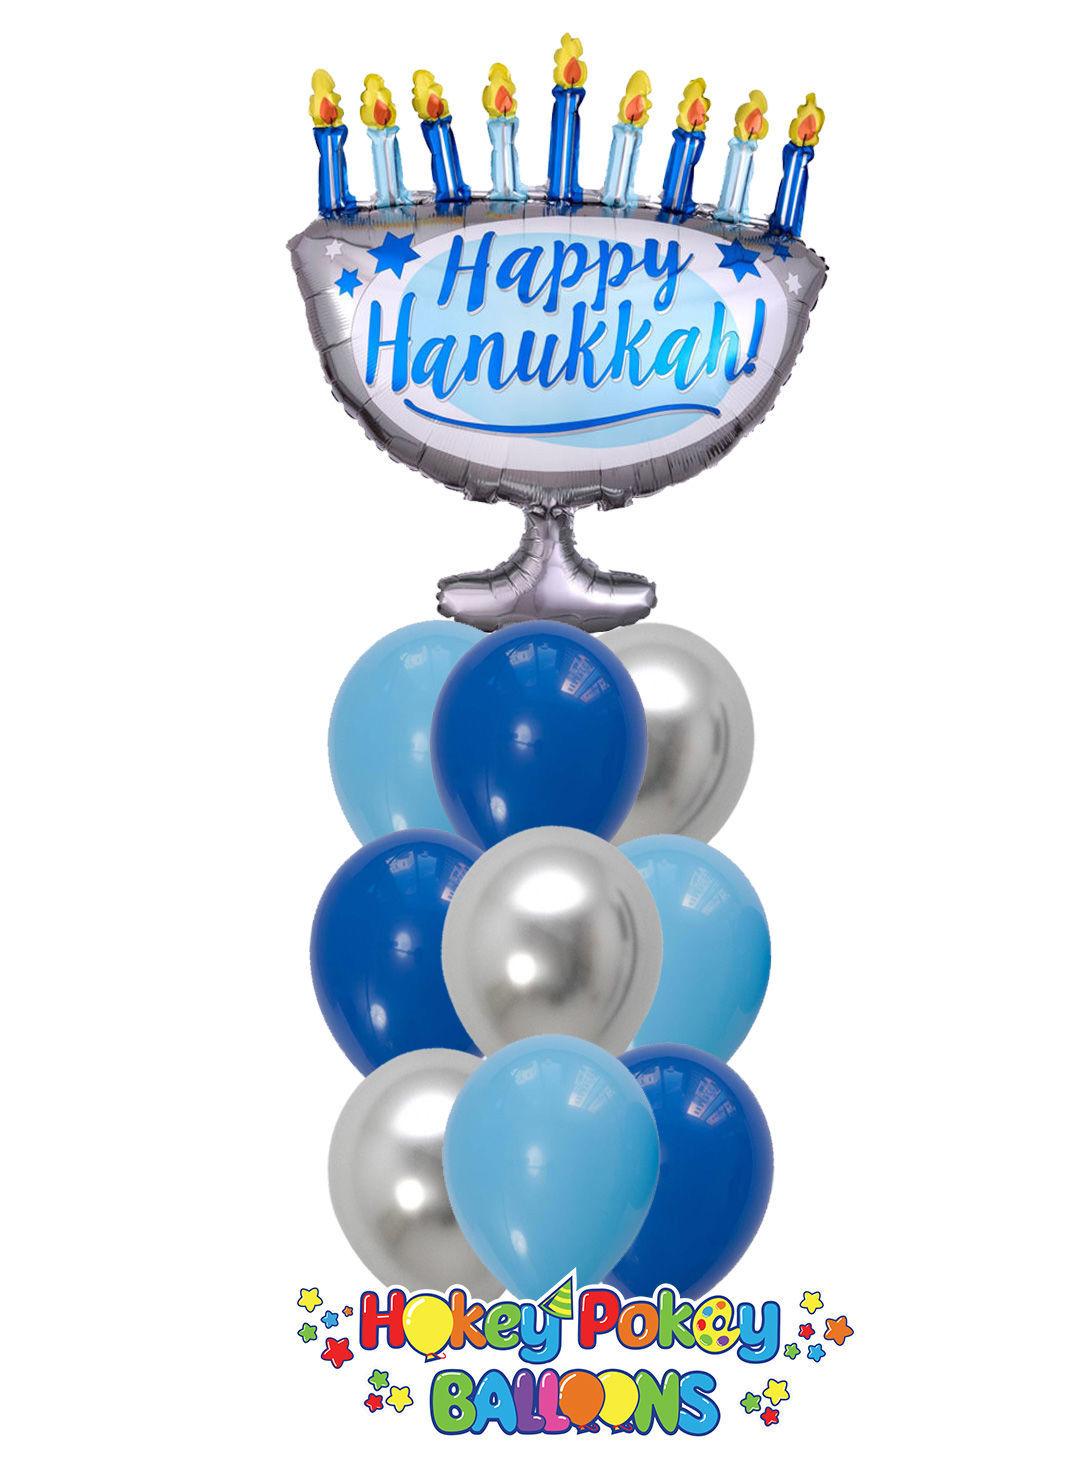 Picture of Happy Hanukkah Balloon Bouquet of 10